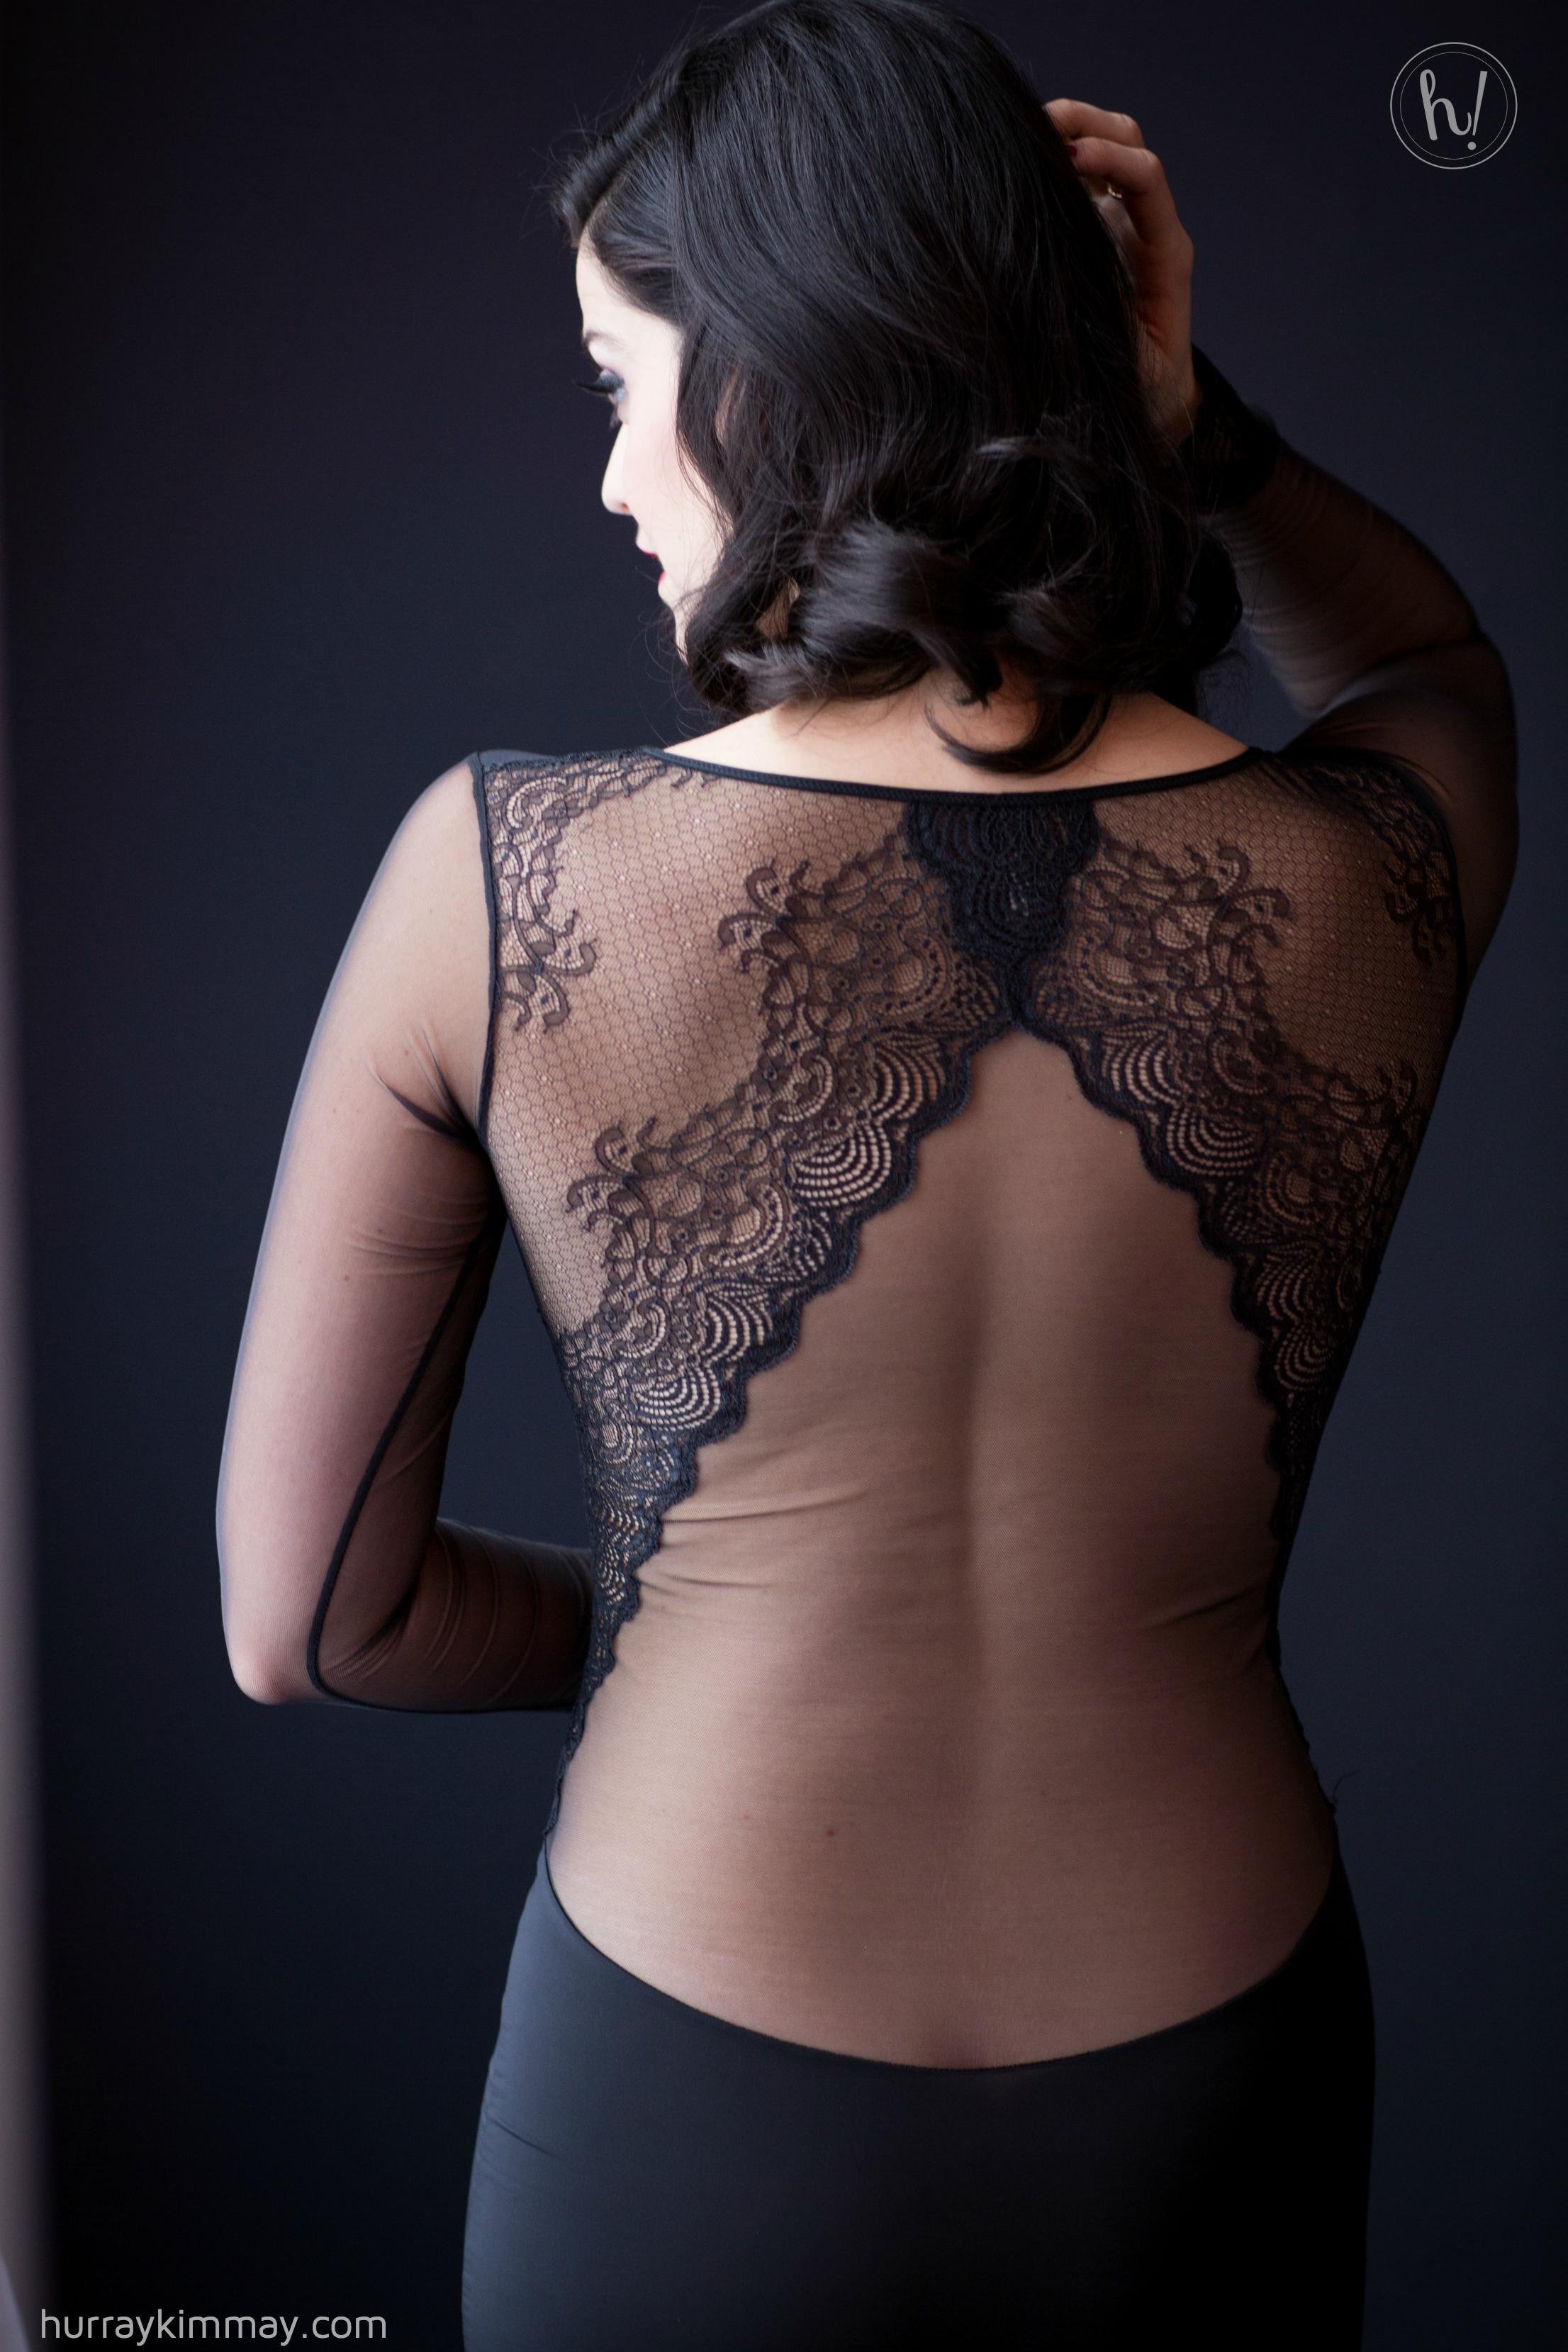 Kimmay wearing sexy Maison Close sheer lace back dress